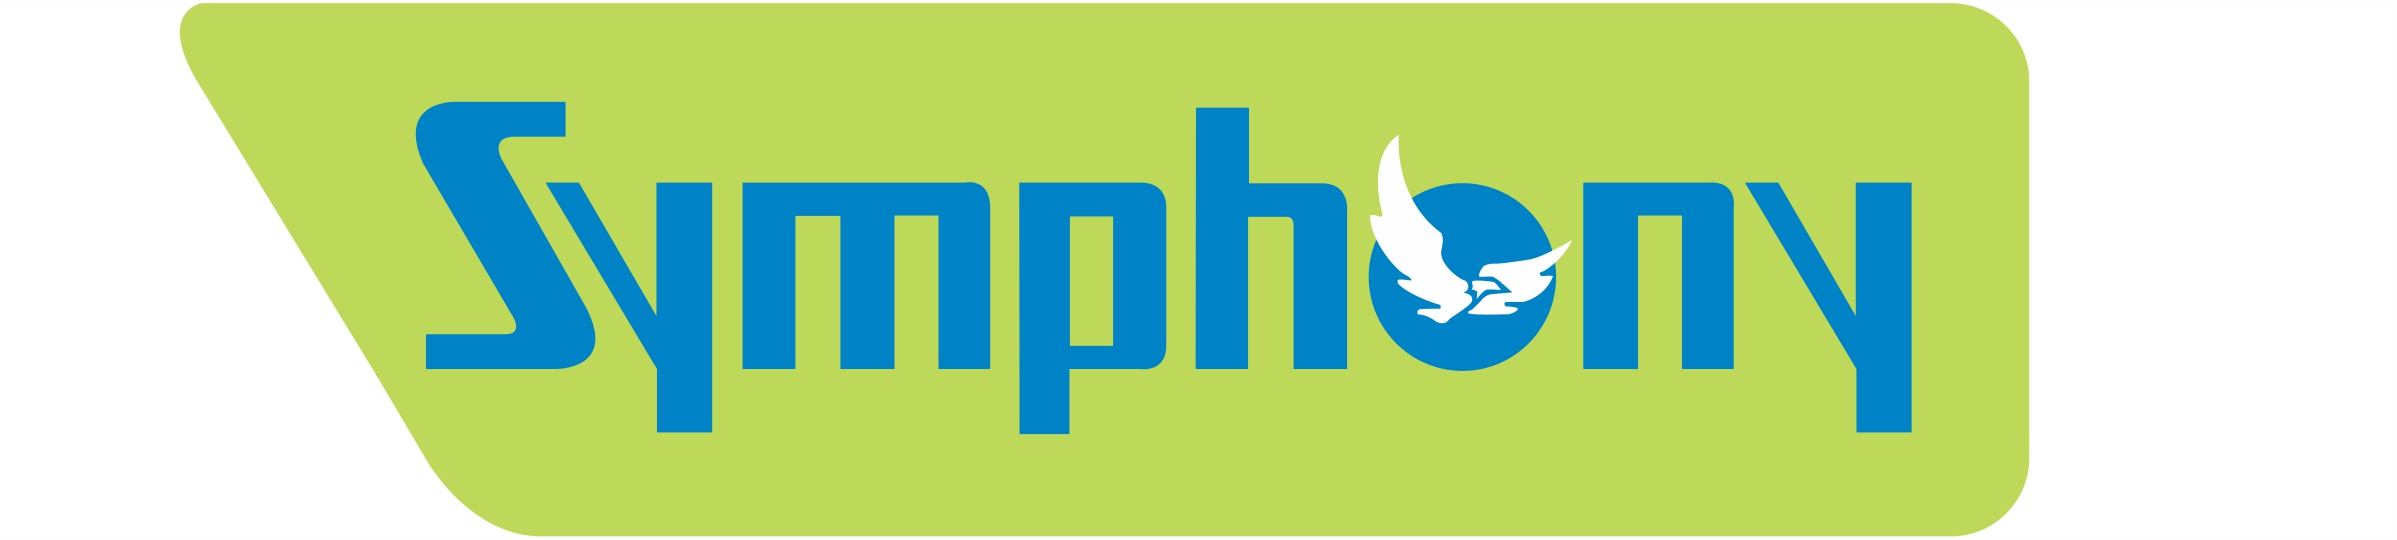 Symphony mobile Logos